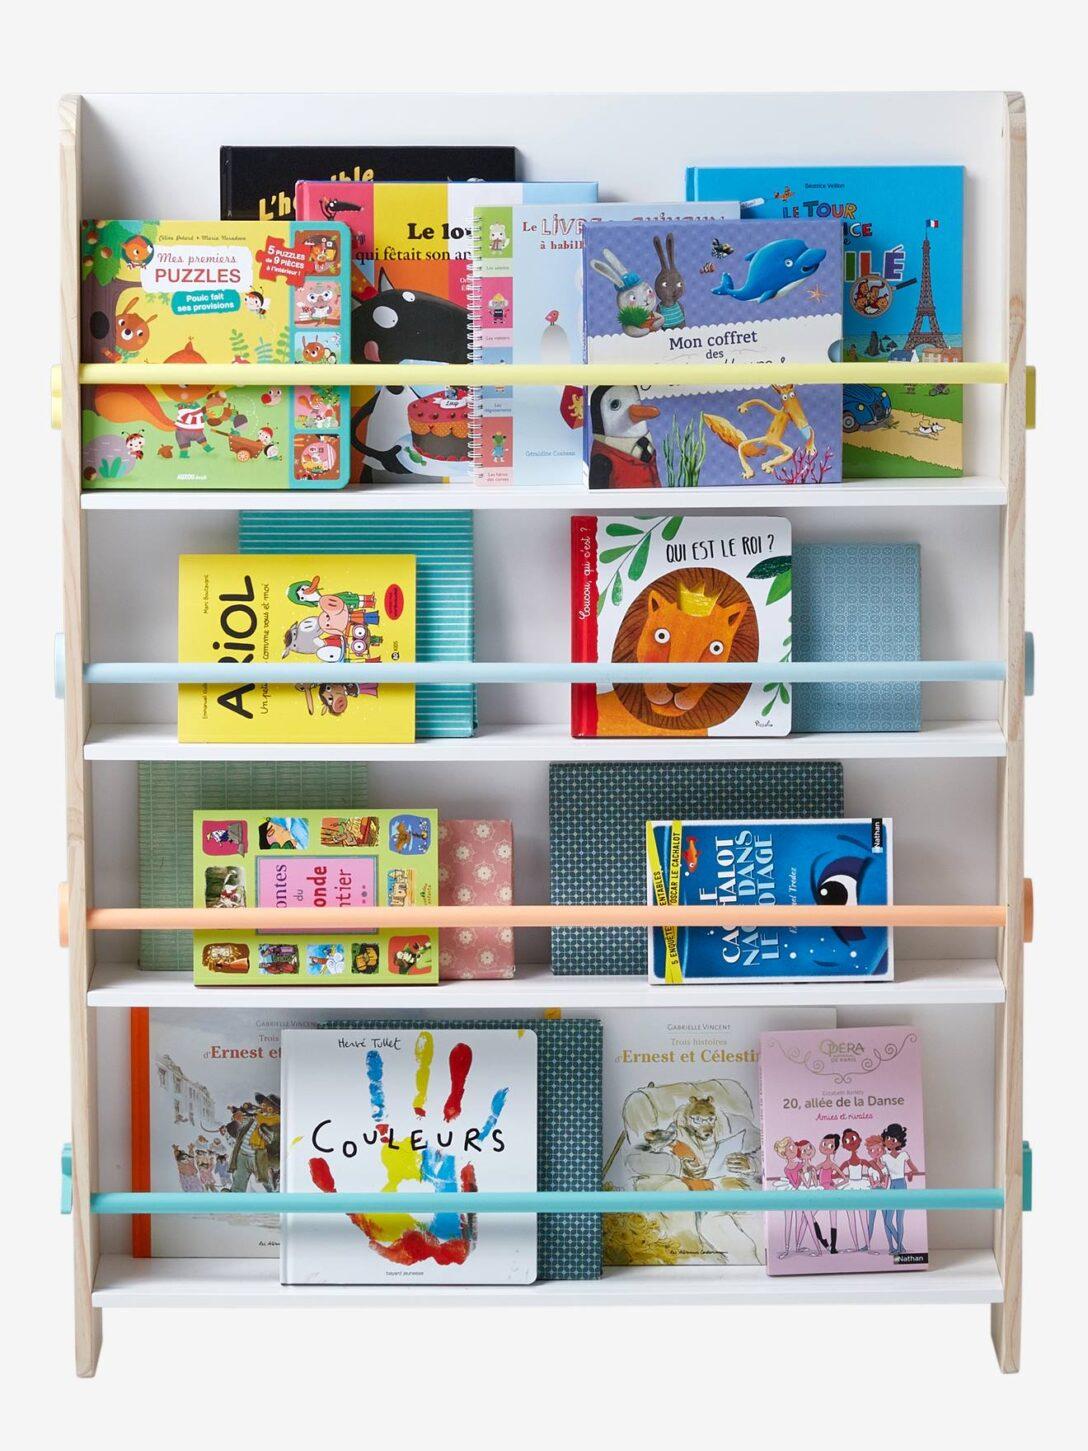 Large Size of Bücherregal Kinderzimmer Vertbaudet Bcherregal Regal Weiß Regale Sofa Kinderzimmer Bücherregal Kinderzimmer